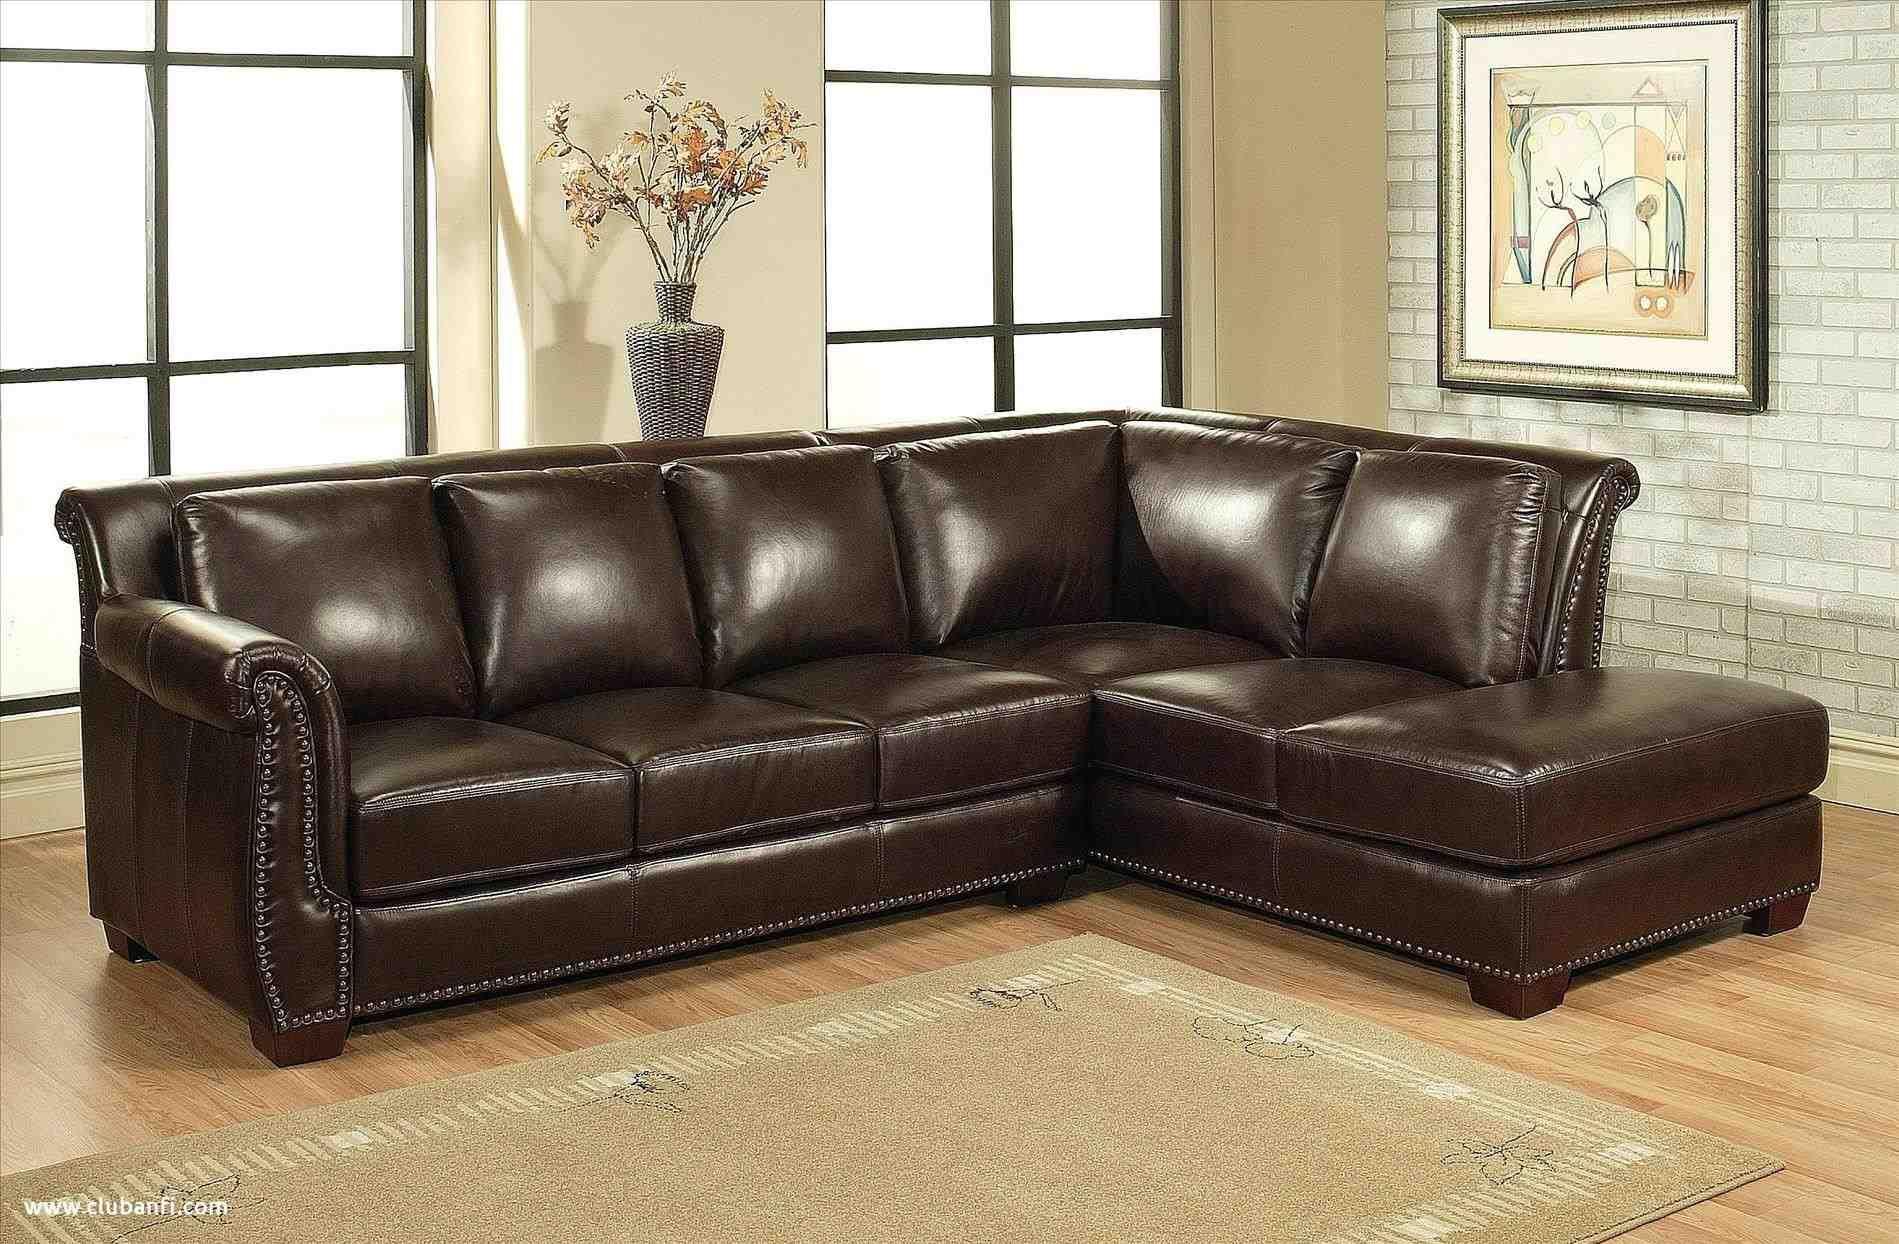 Cheap Leather Sofas Perth  Modular Leatherfa Corner Okaycreations Net